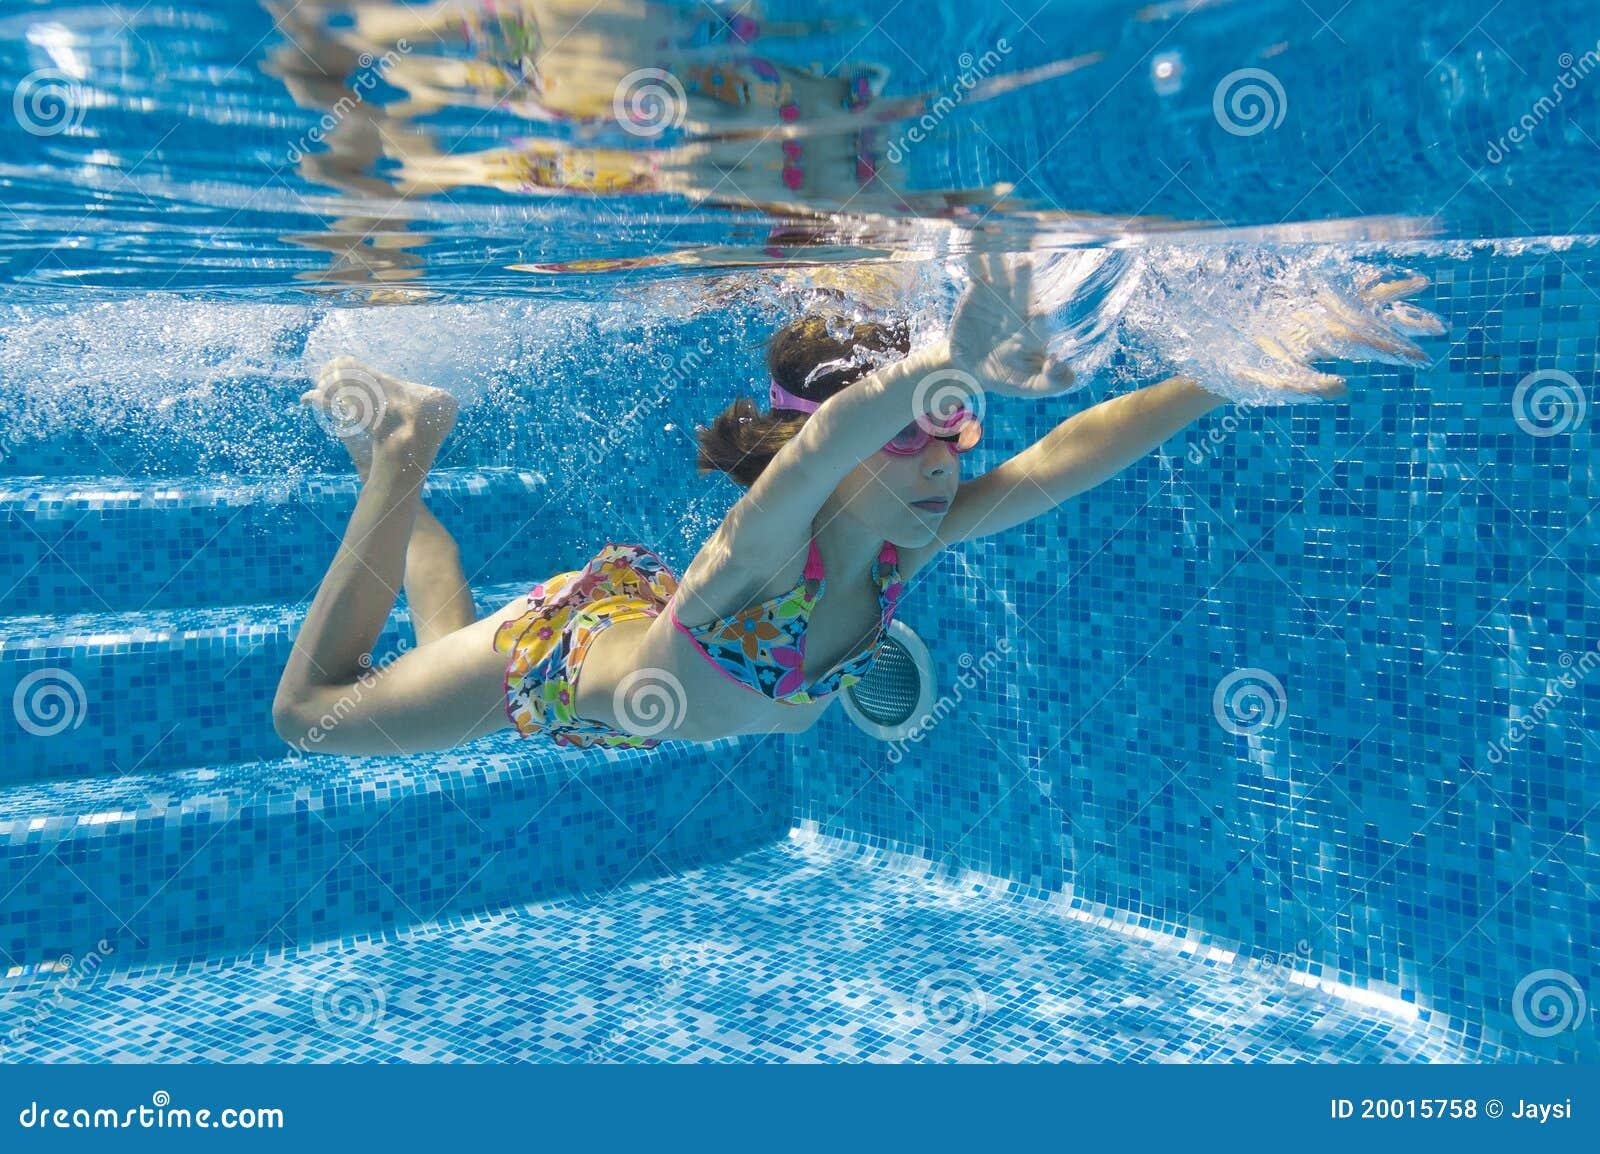 Underwater Kid In Swimming Pool Royalty Free Stock Photos Image 20015758